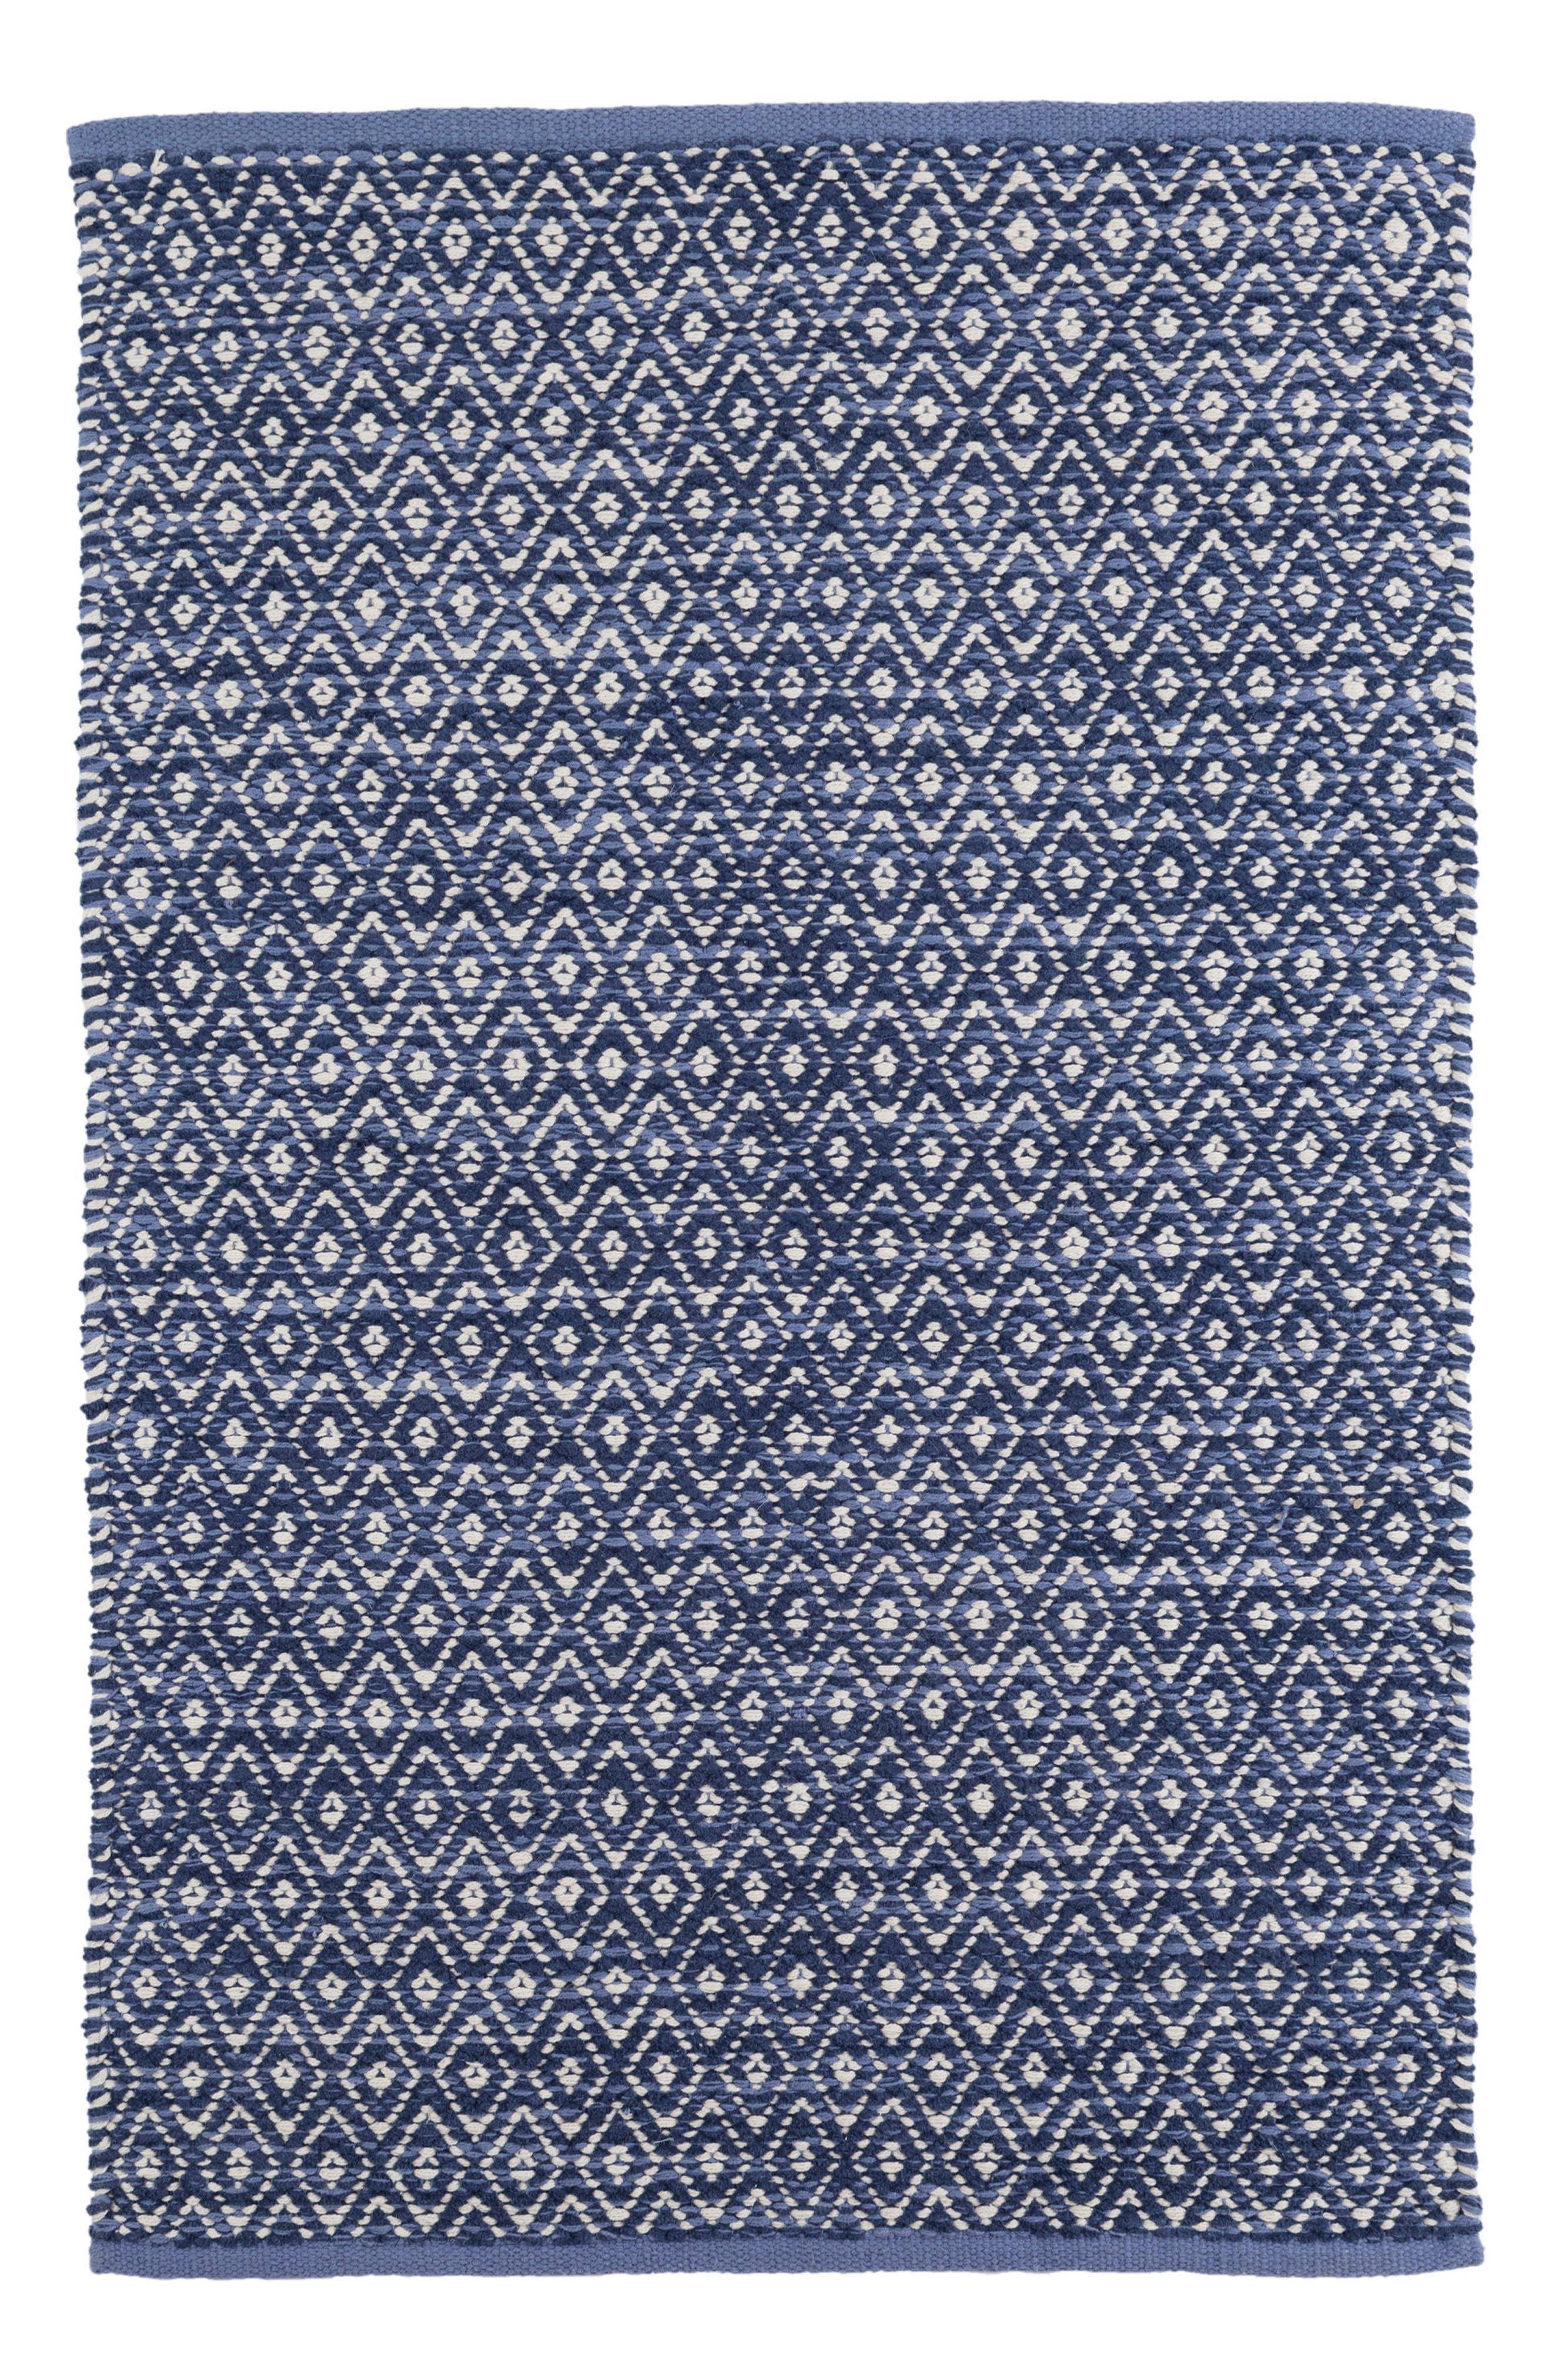 Main Image - Dash & Albert Diamond Chenille Woven Rug